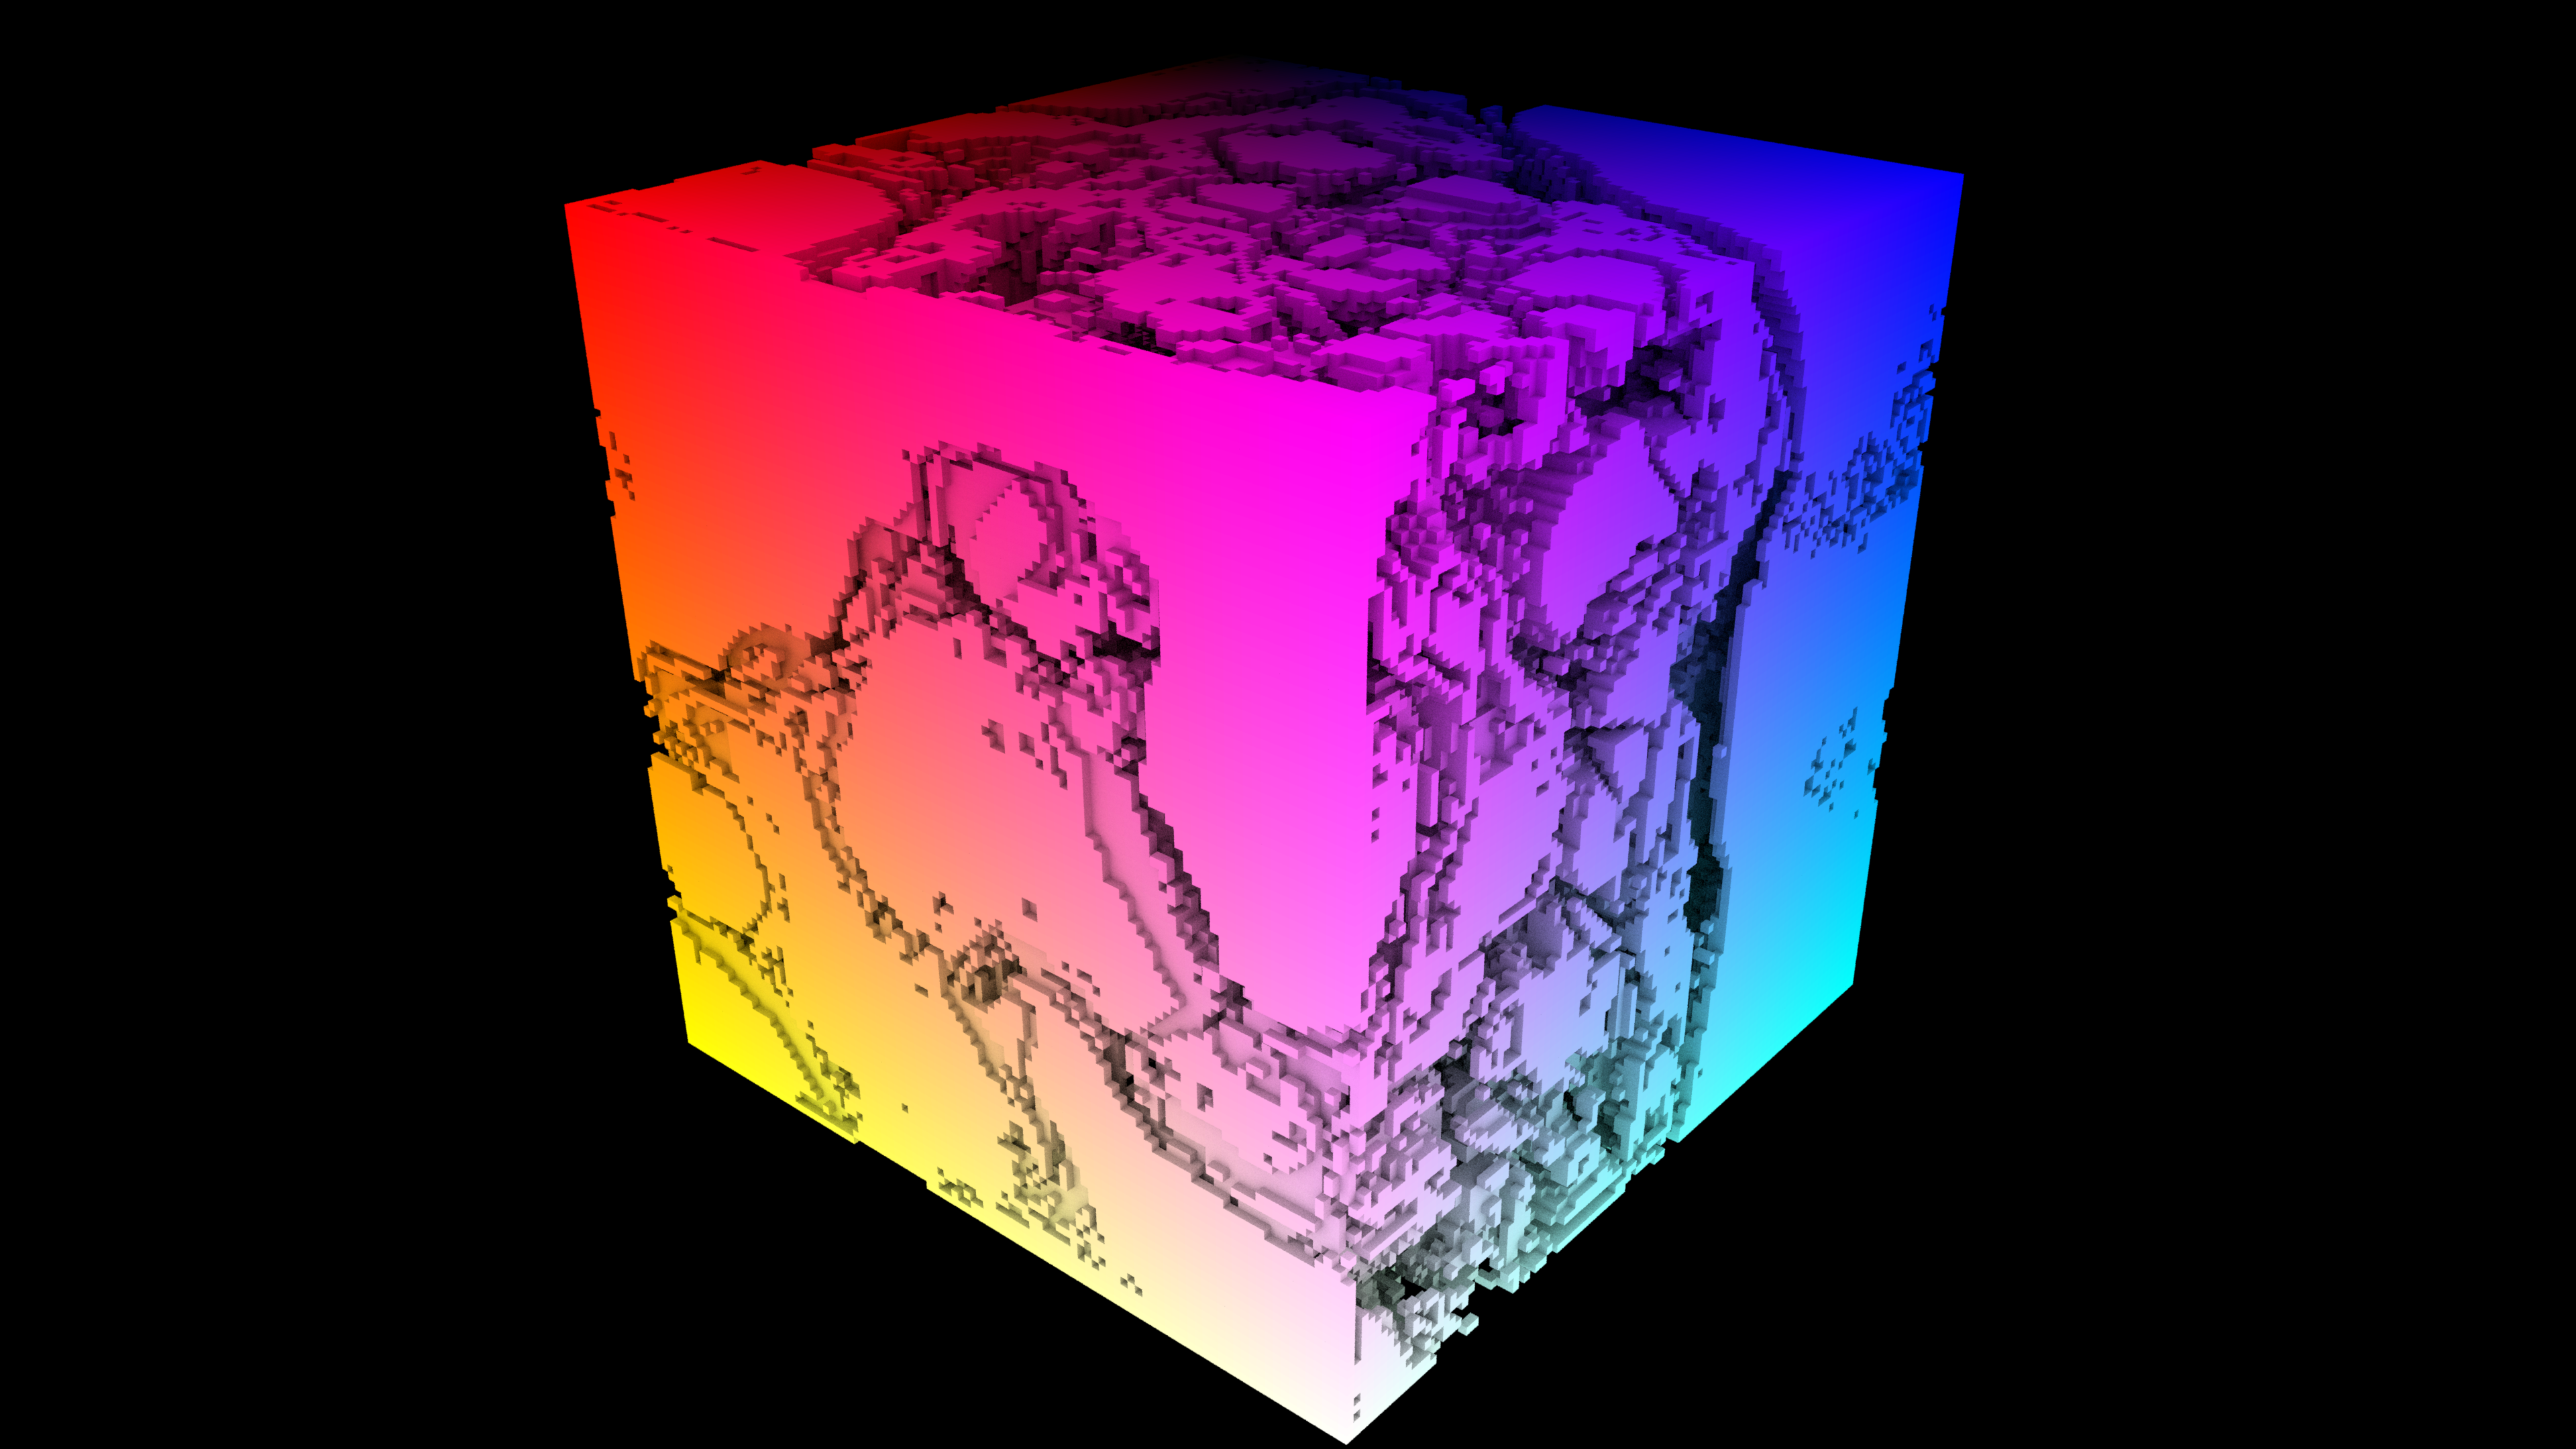 3d cellular automata simulation dating